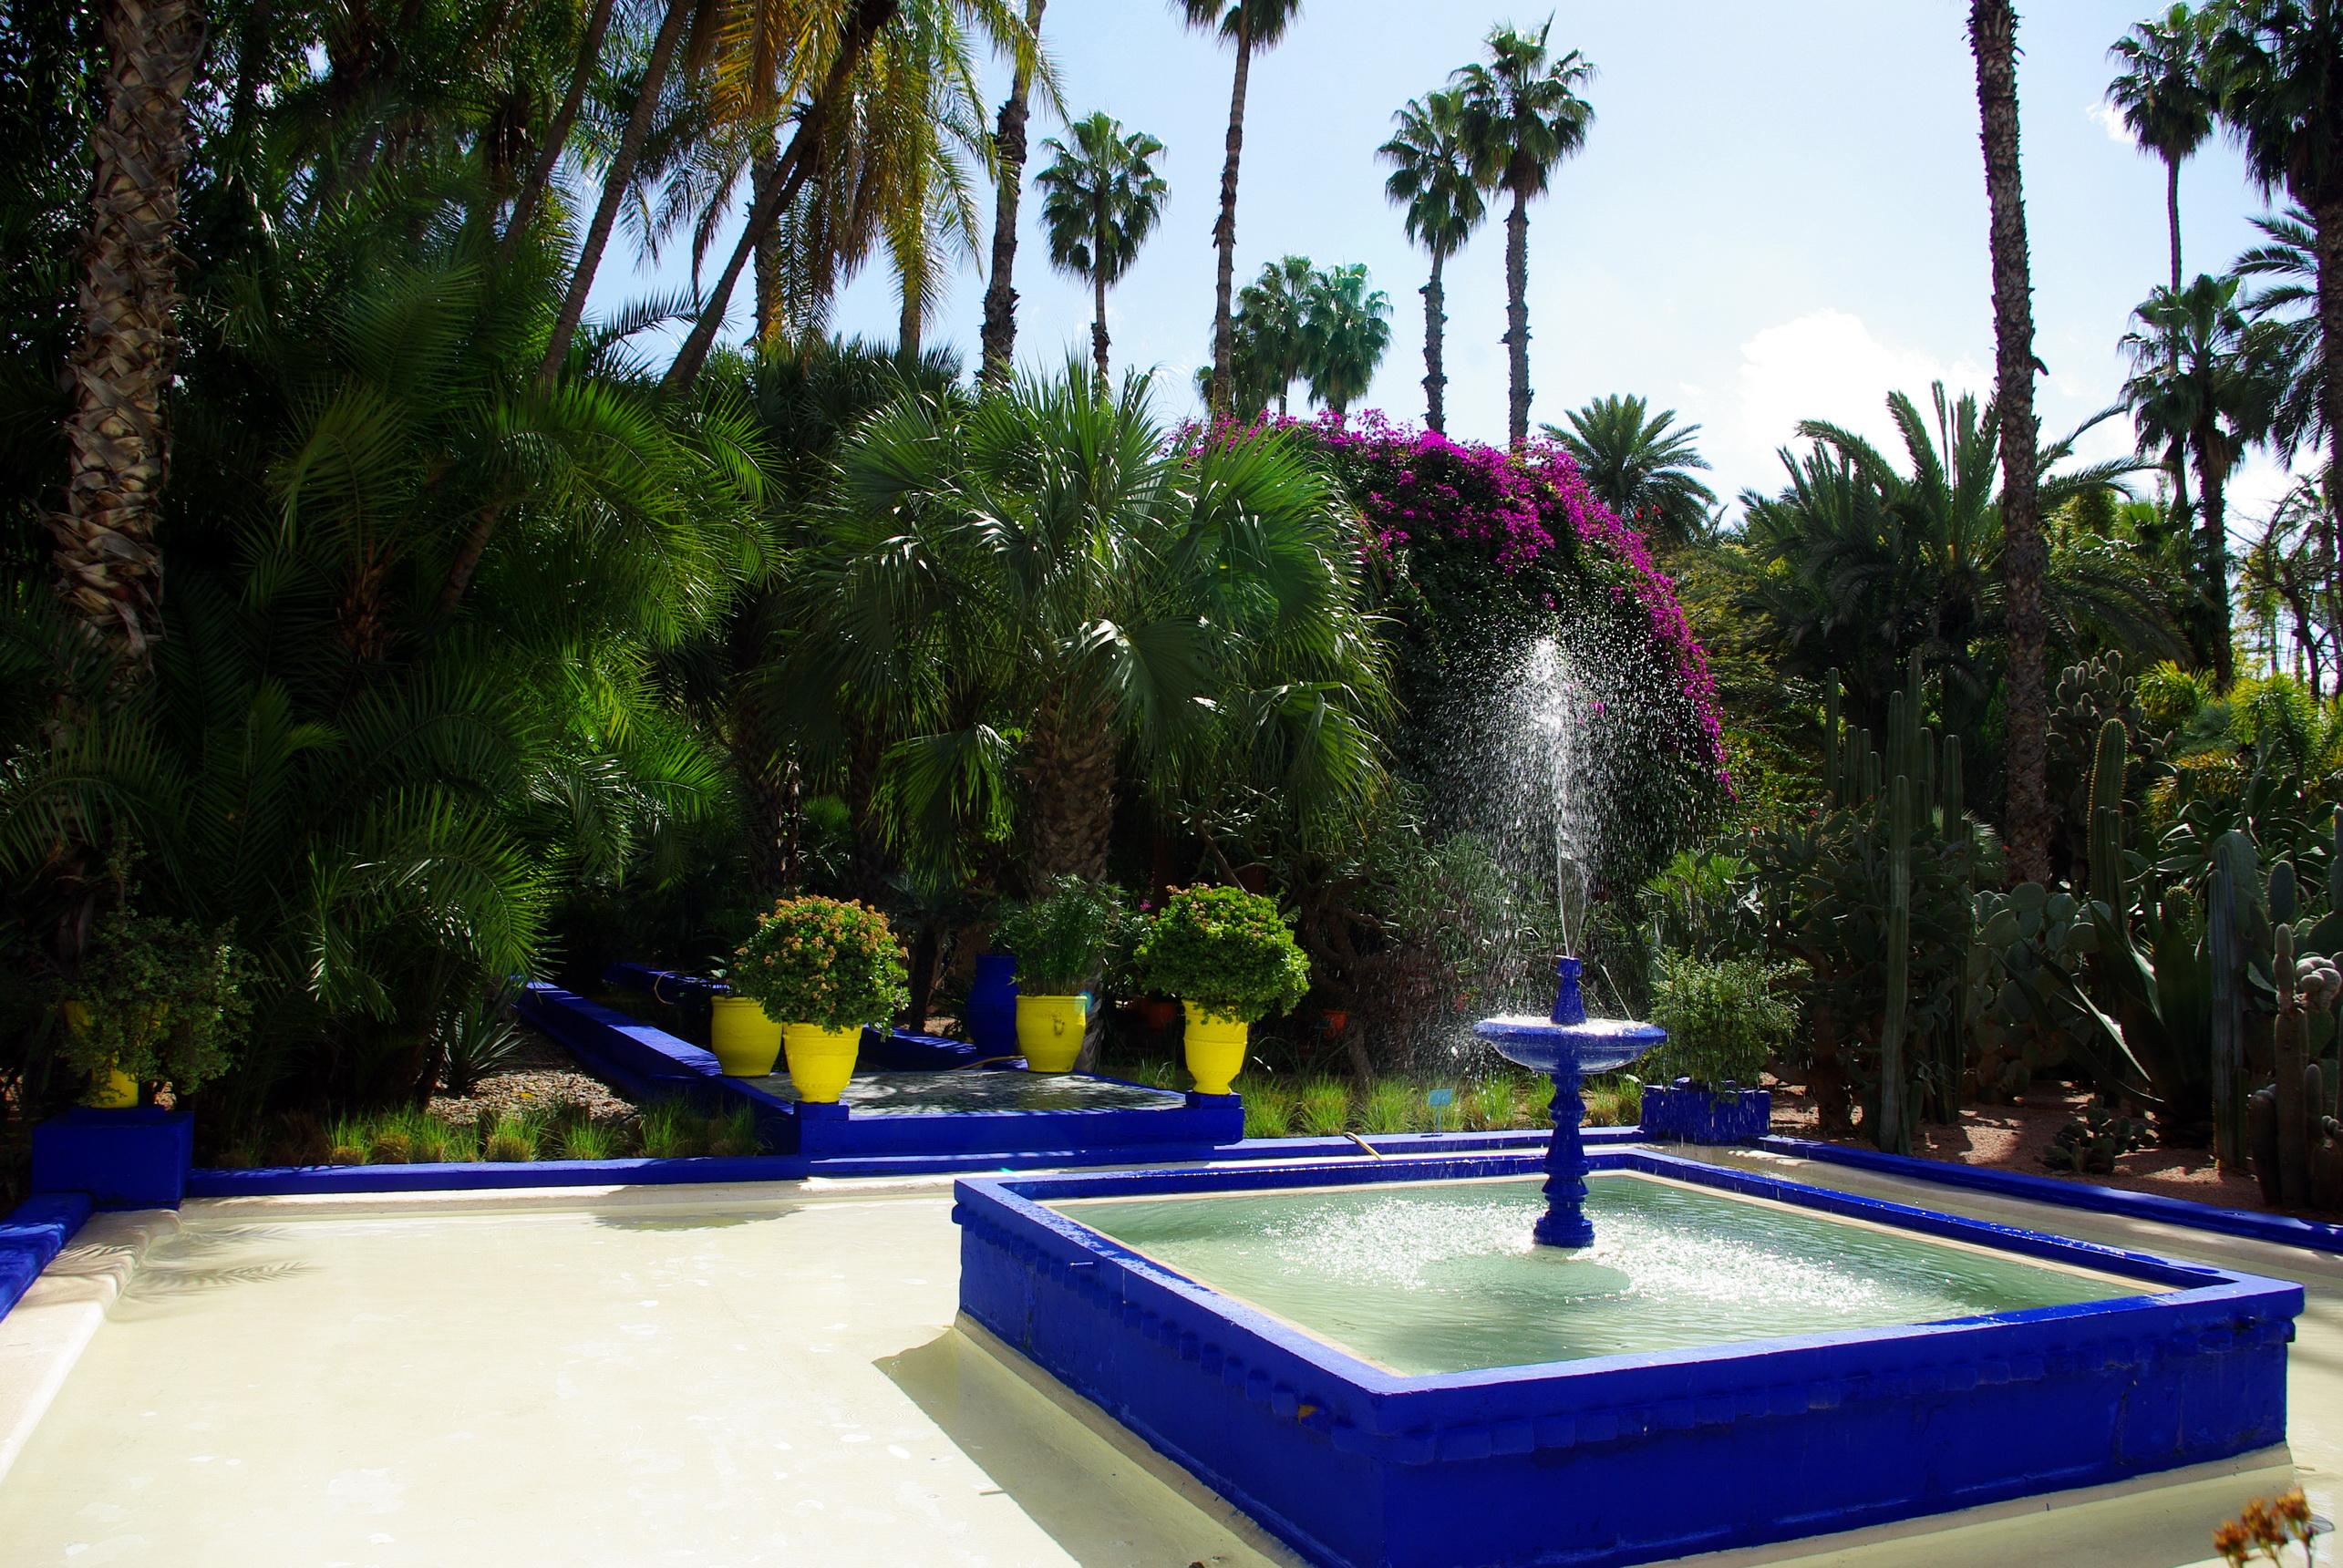 Morocco marrakech jardin majorelle full hd fond d 39 cran and arri re plan 2570x1720 id 285411 - Fond d ecran jardin anglais ...